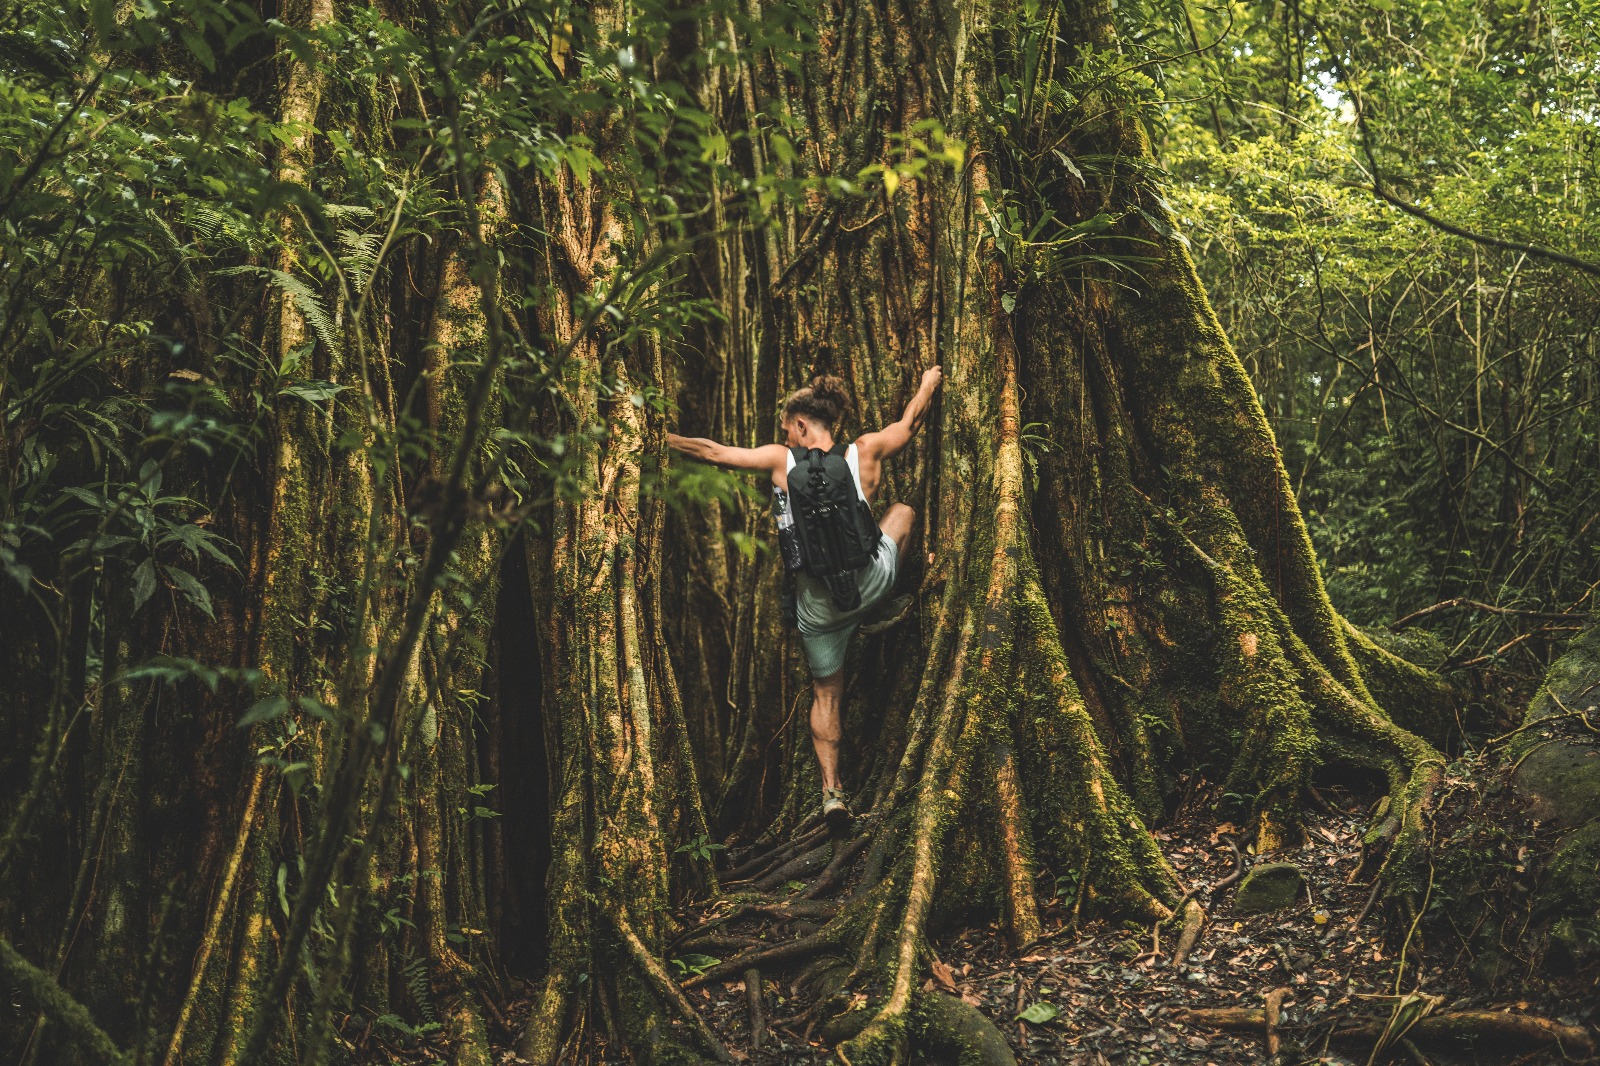 Indiana Jones Jungle Treasure Hunt